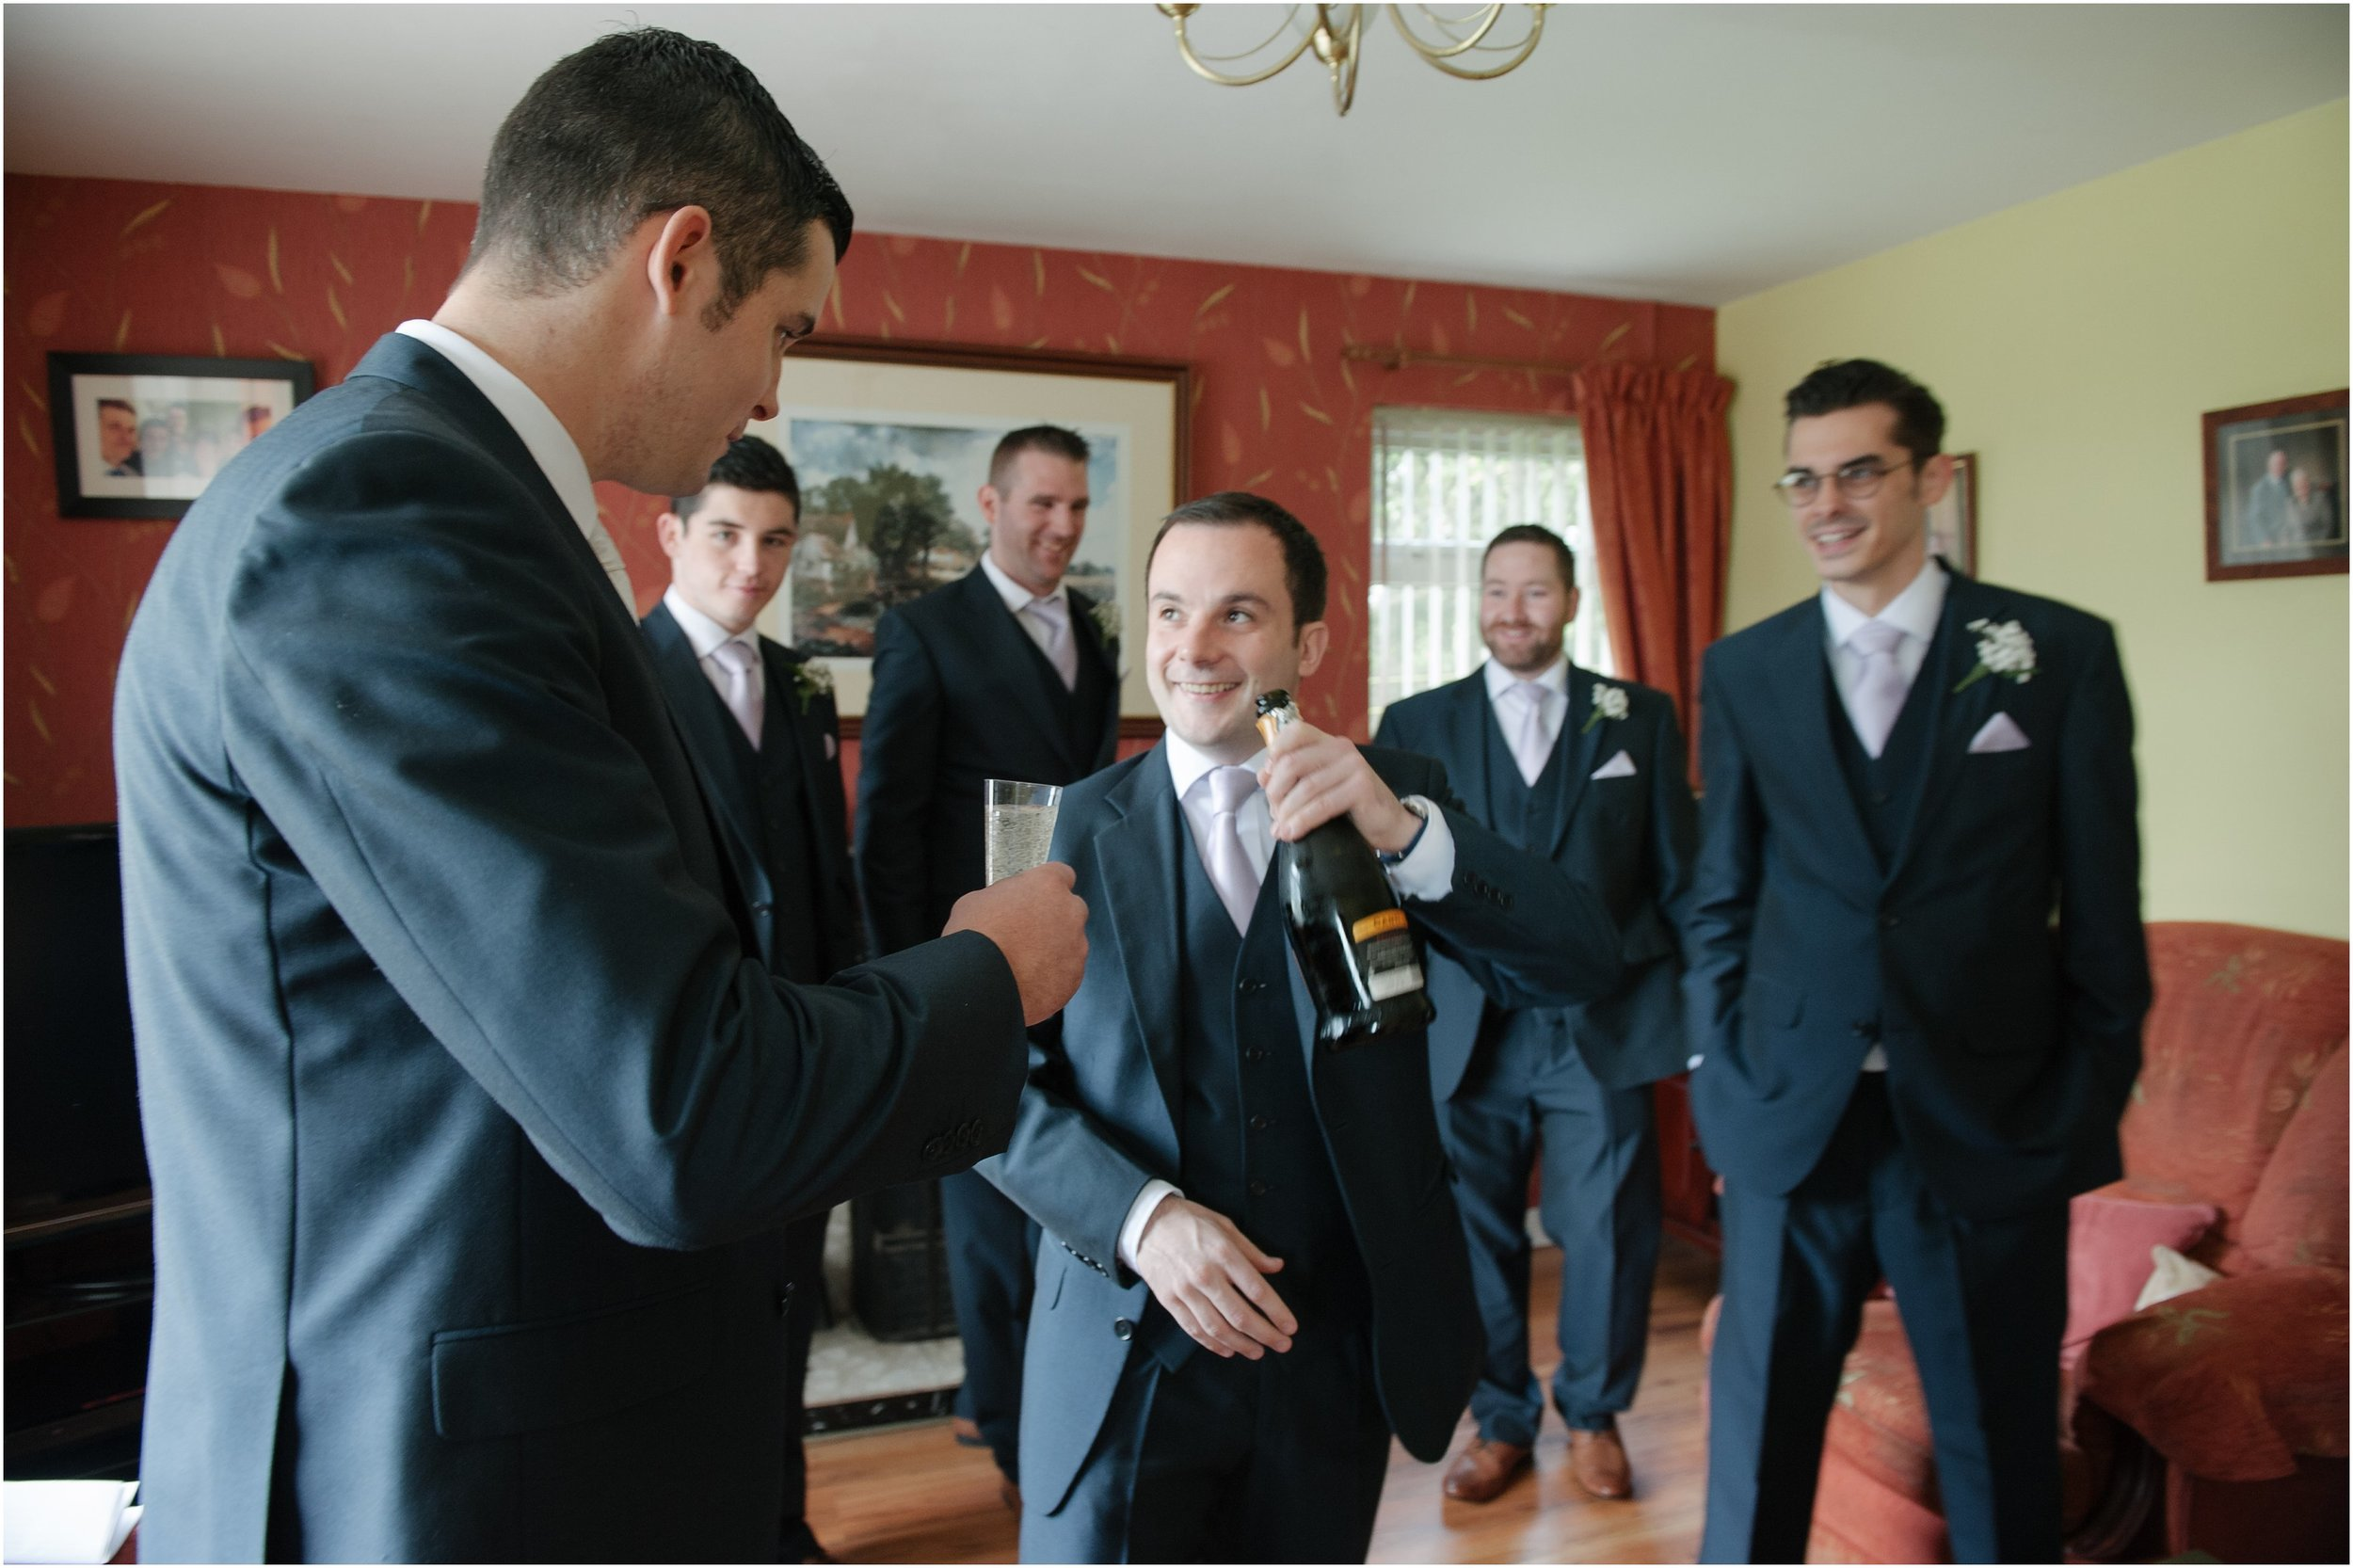 laura-lee-stephen-lough-erne-resort-wedding-photography-co-fermanagh_0022.jpg